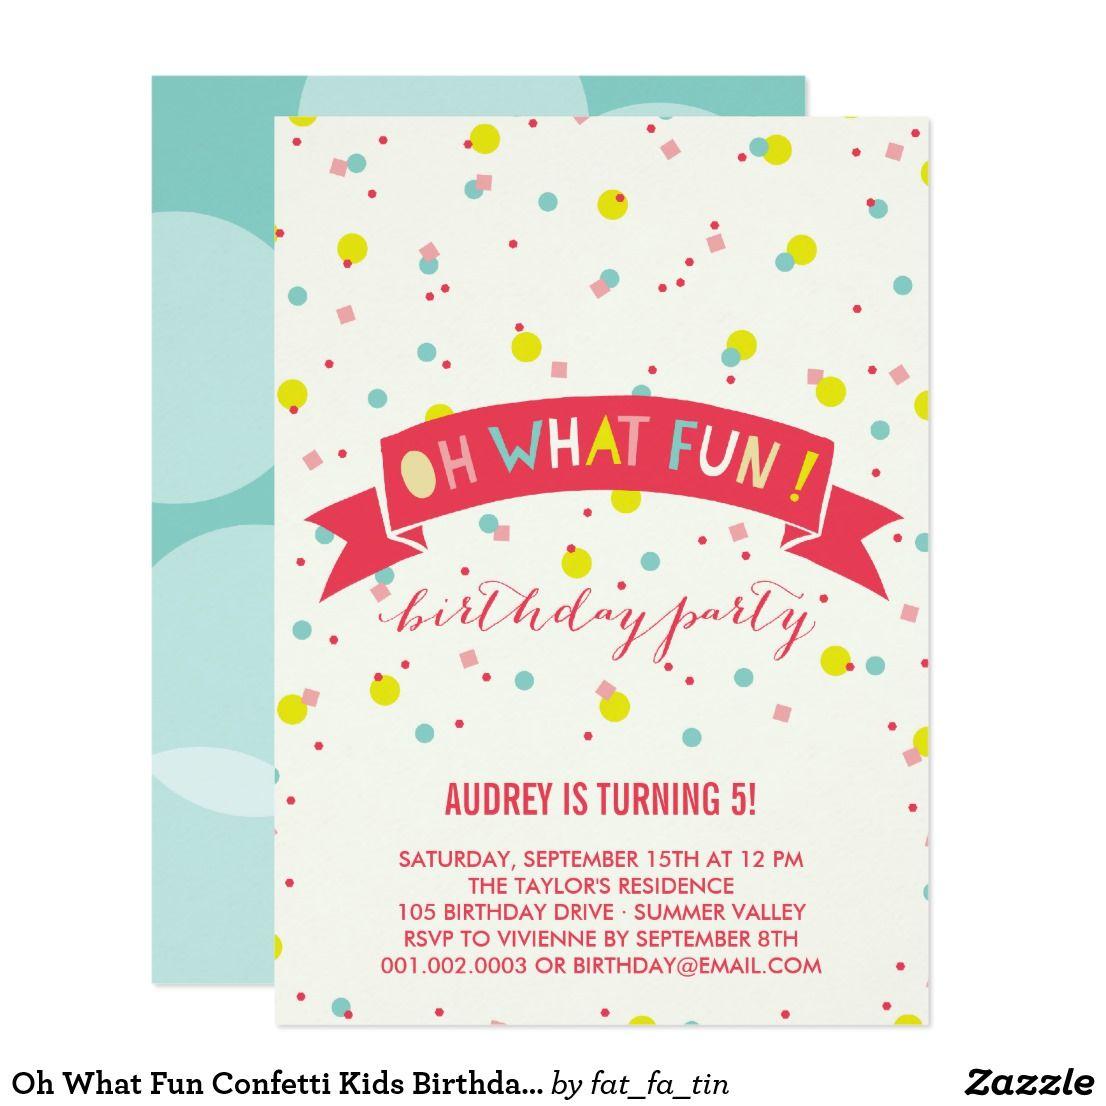 Oh What Fun Confetti Kids Birthday Party Invite | Birthdays